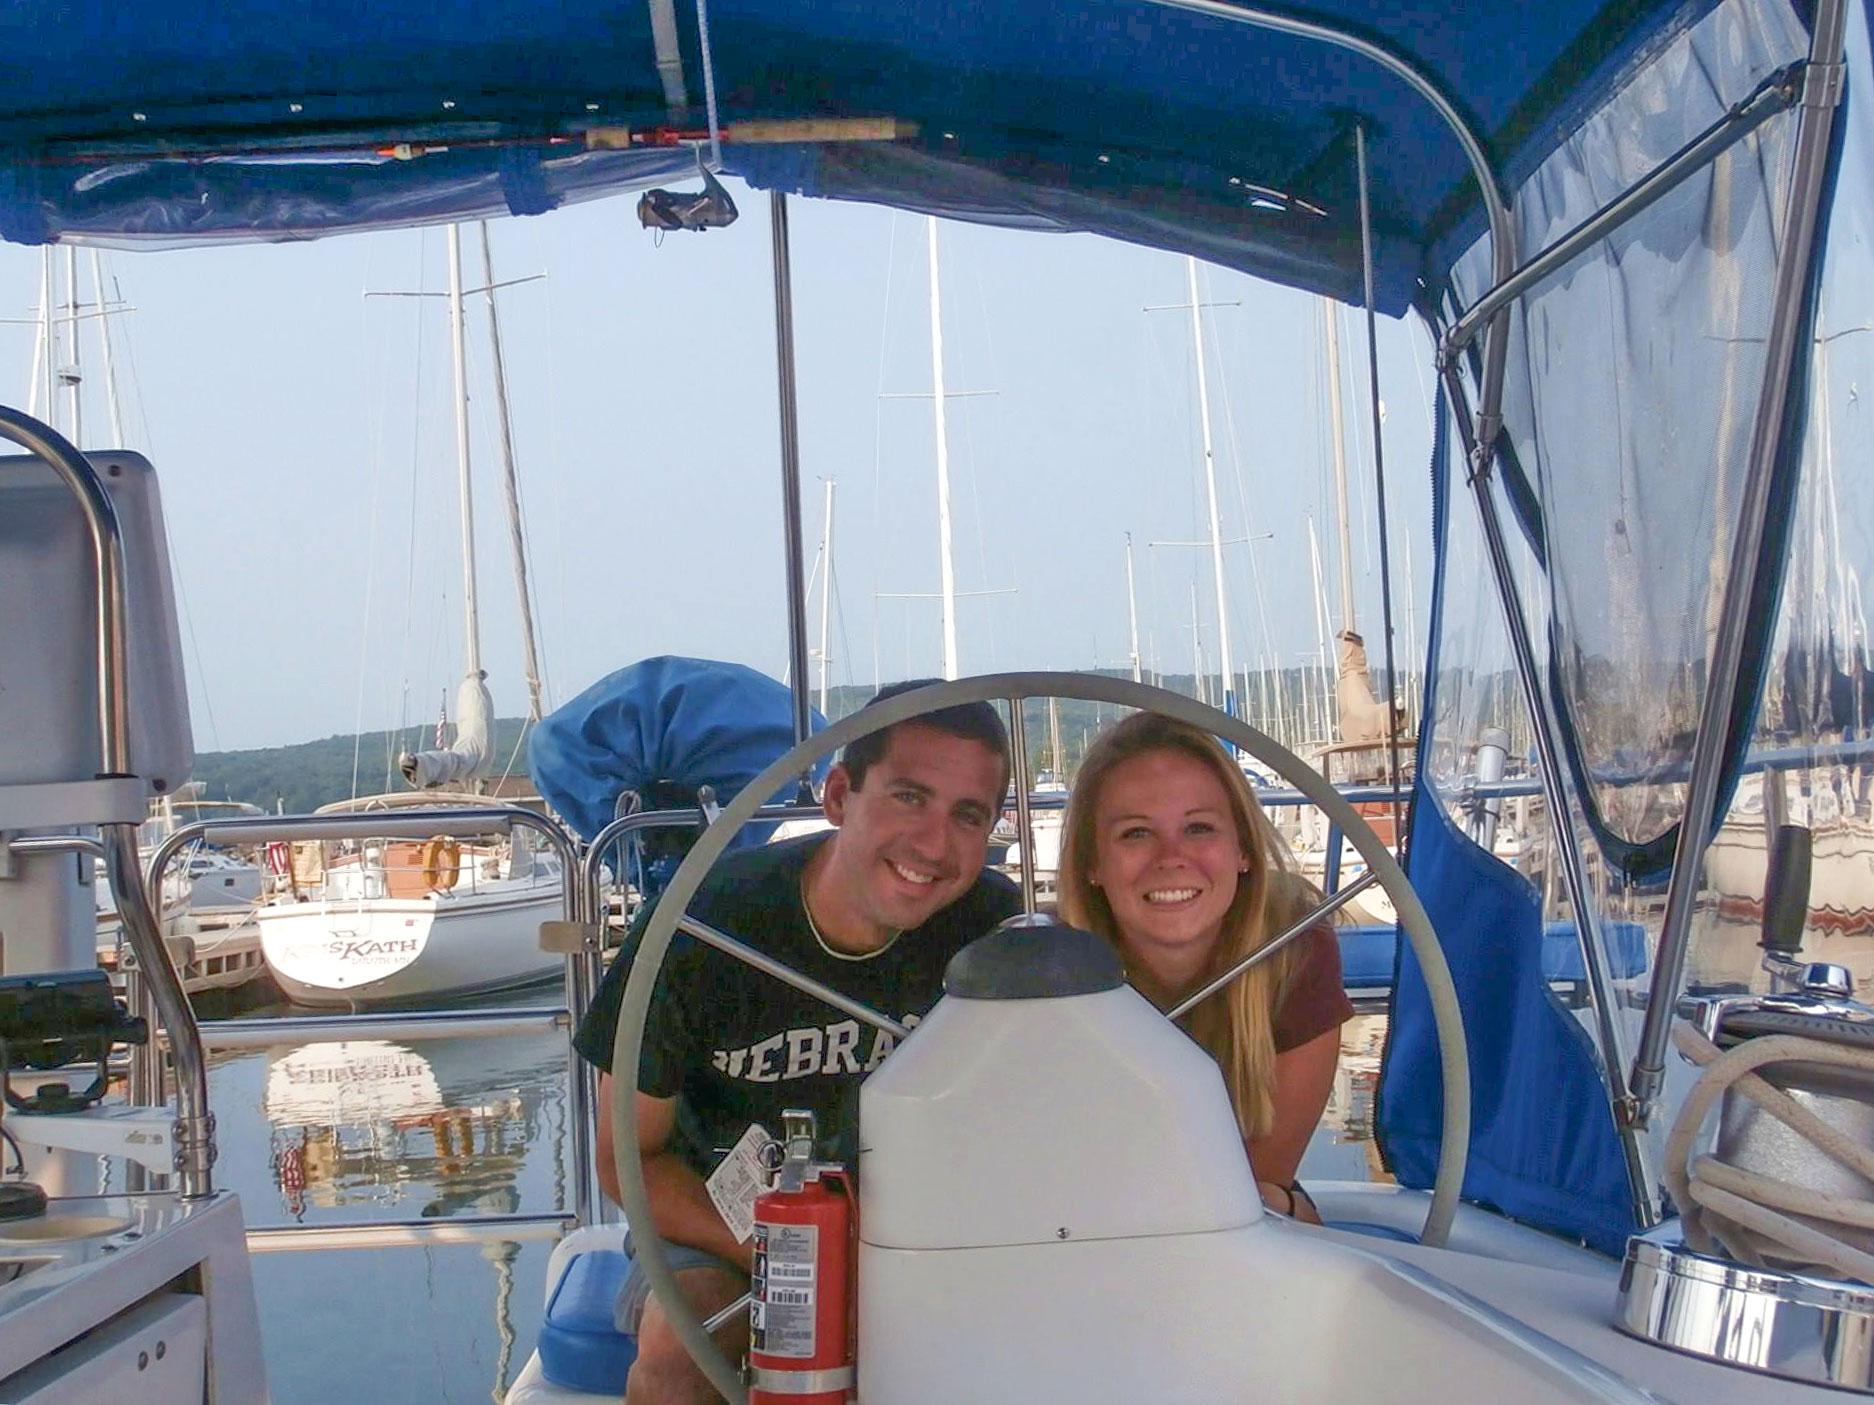 Josh Sweet and friend on sailboat